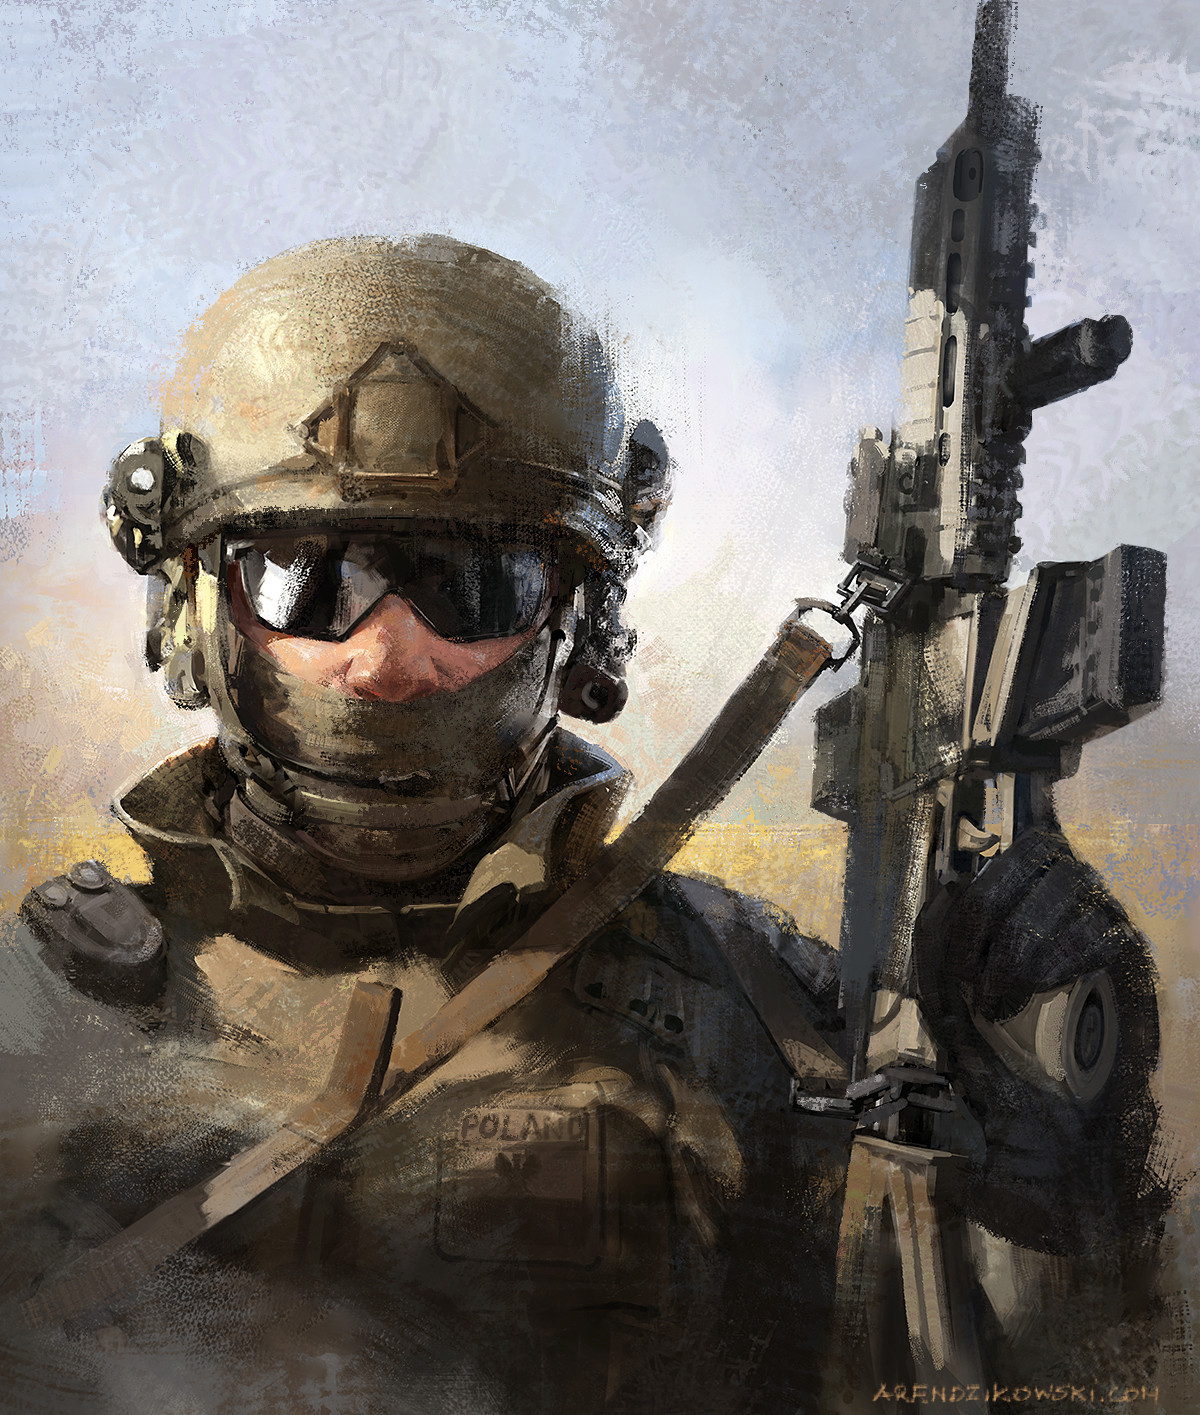 GROM Operator